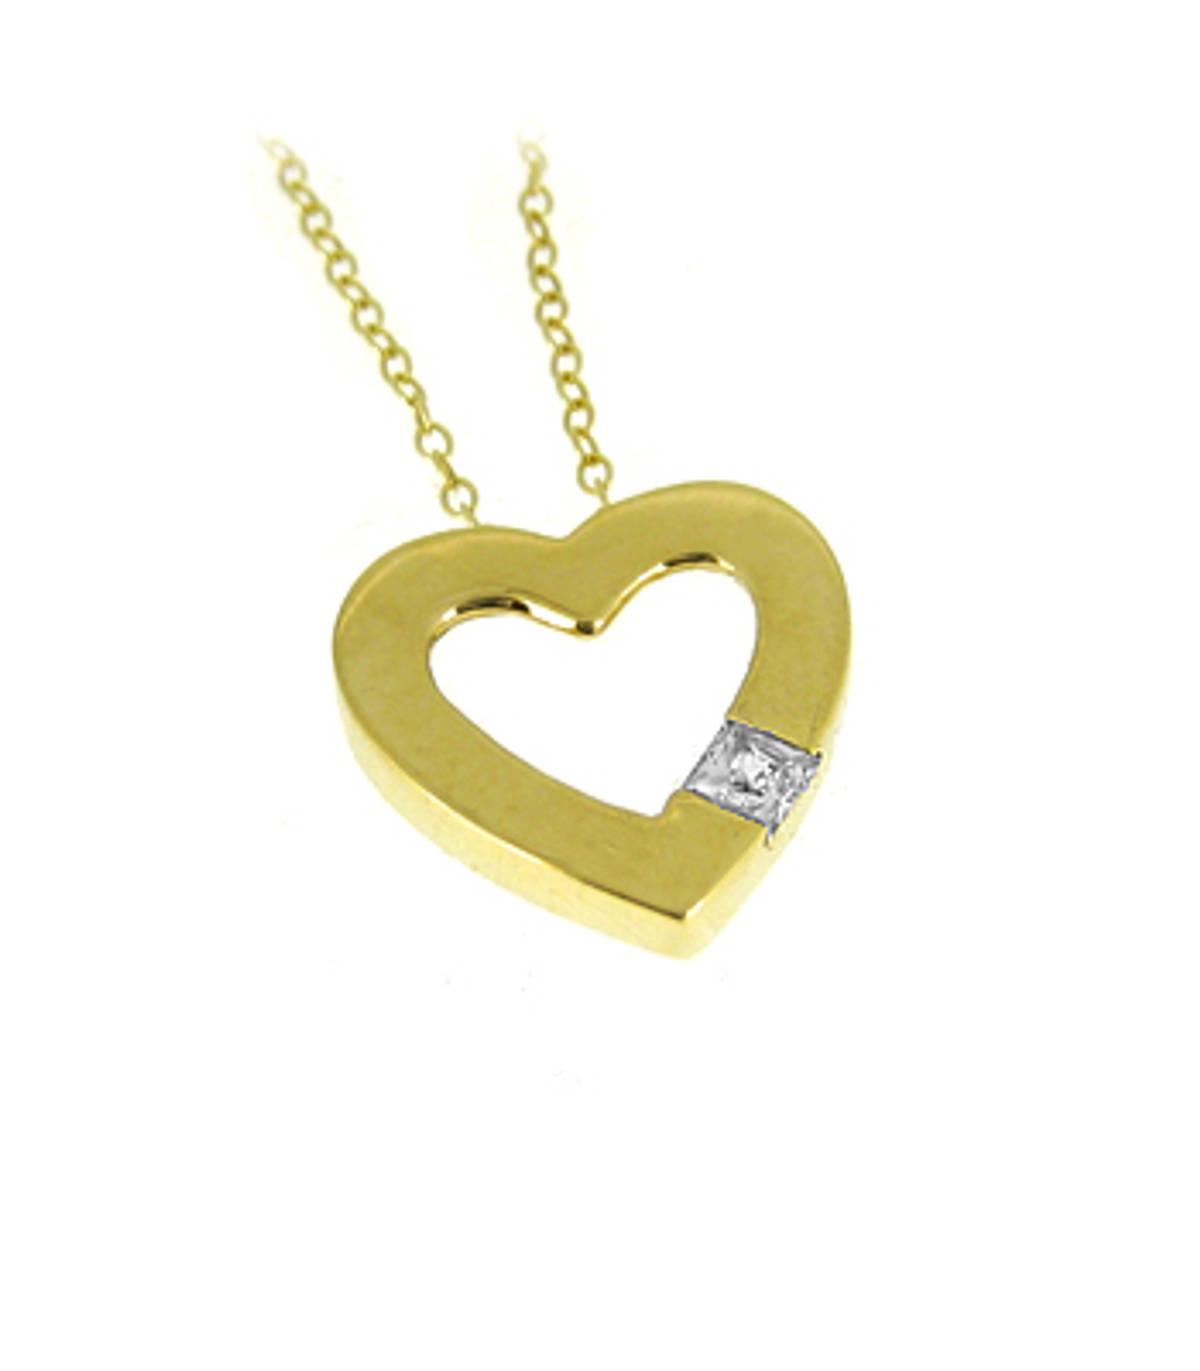 "9k yellow gold open heart CZ pendant on 9k yellow gold 18"" chain 9k yellow gold 18"" chain Metal: 9k yellow gold Length  1.5cm  Width  1.5cm Made in Ireland"